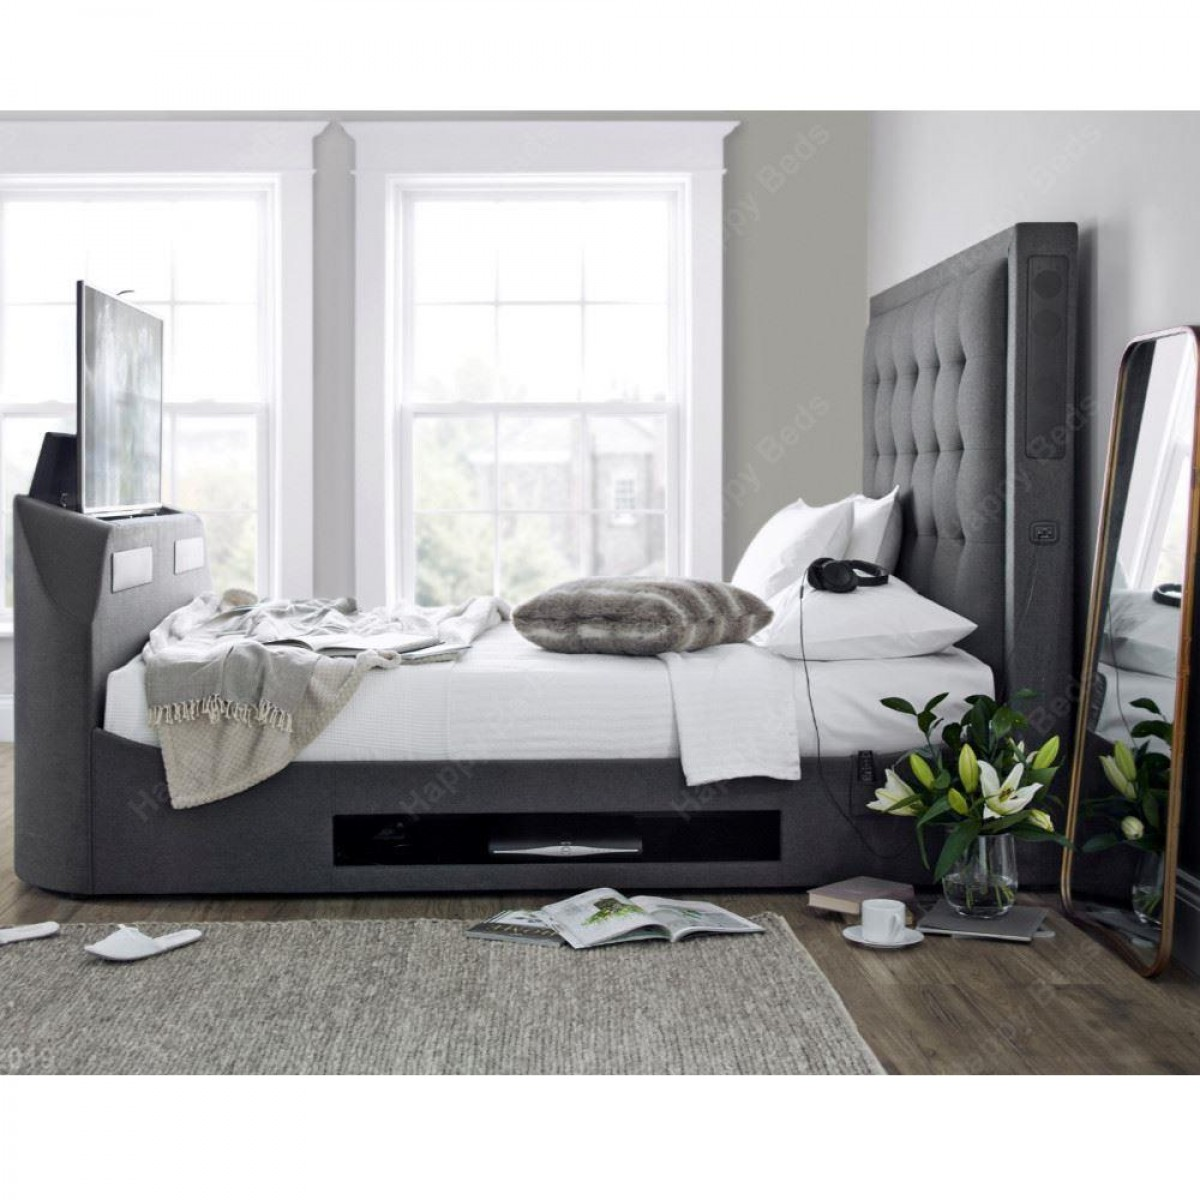 Titan Berwick Grey Fabric TV Media Bed